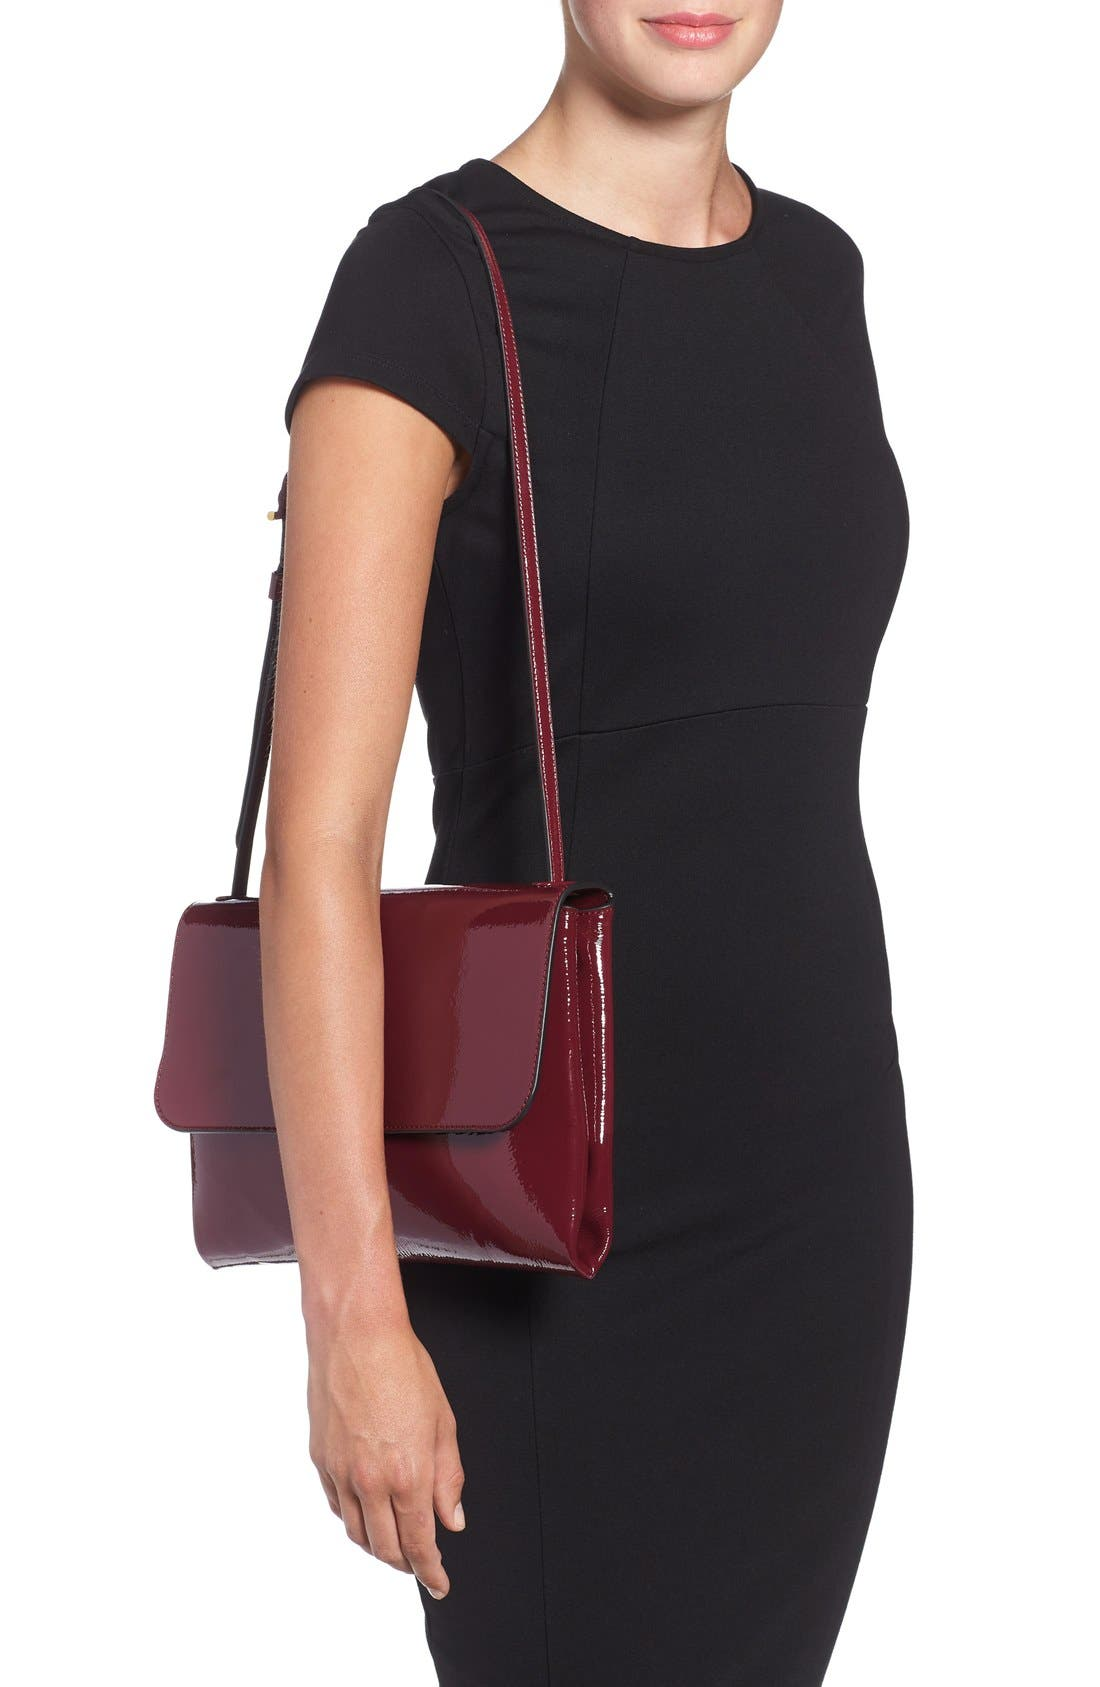 Patent Leather Convertible Shoulder Bag,                             Alternate thumbnail 4, color,                             606